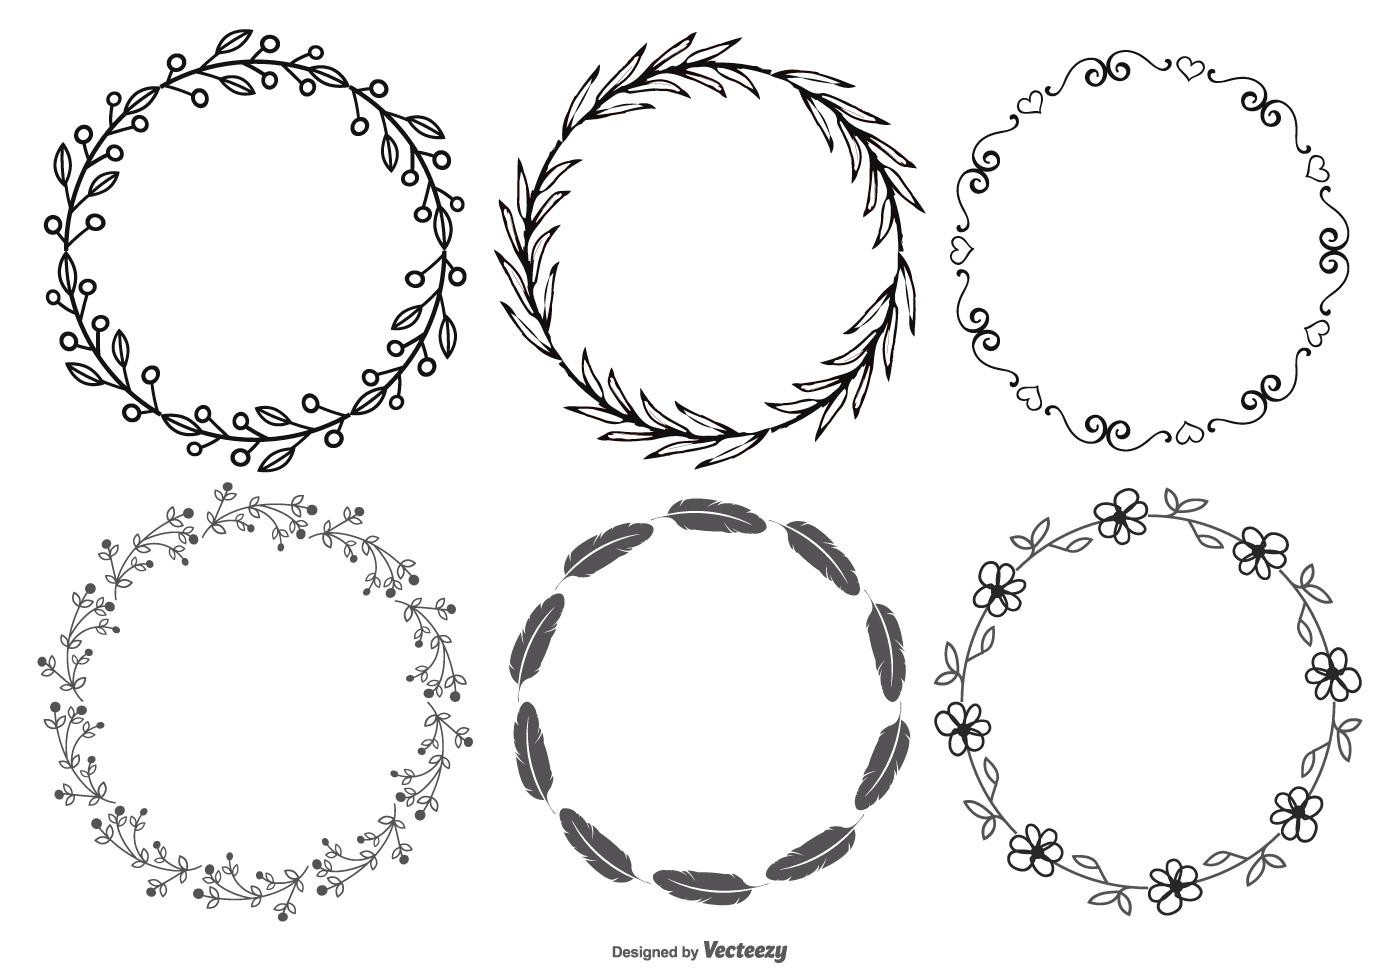 Circle Frame Free Vector Art - (11336 Free Downloads)